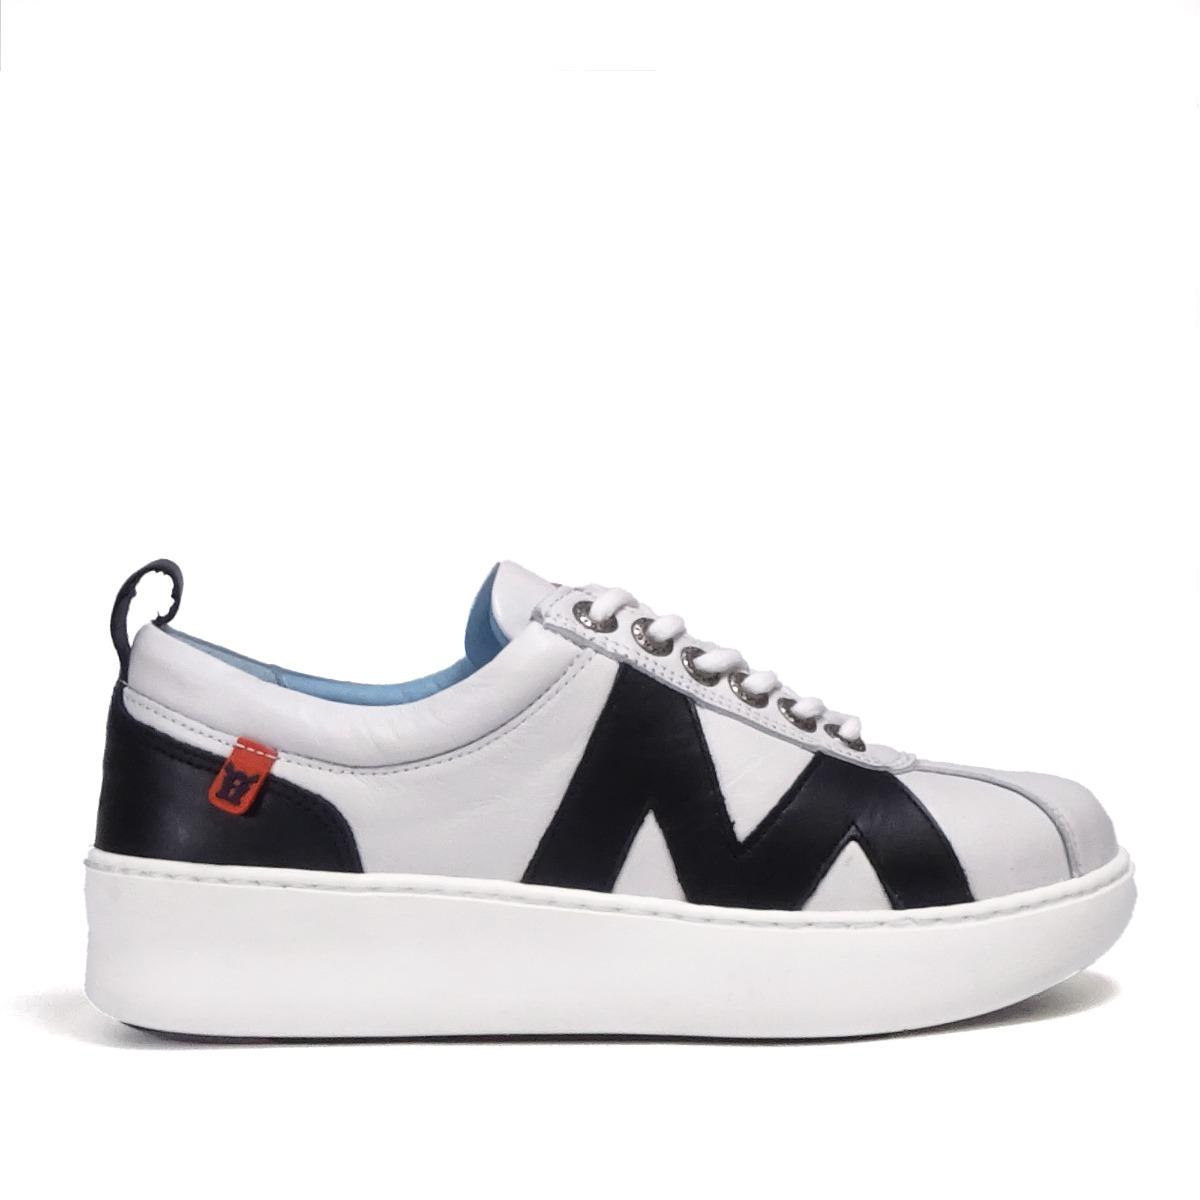 Sympasneaker 4231 White/Black